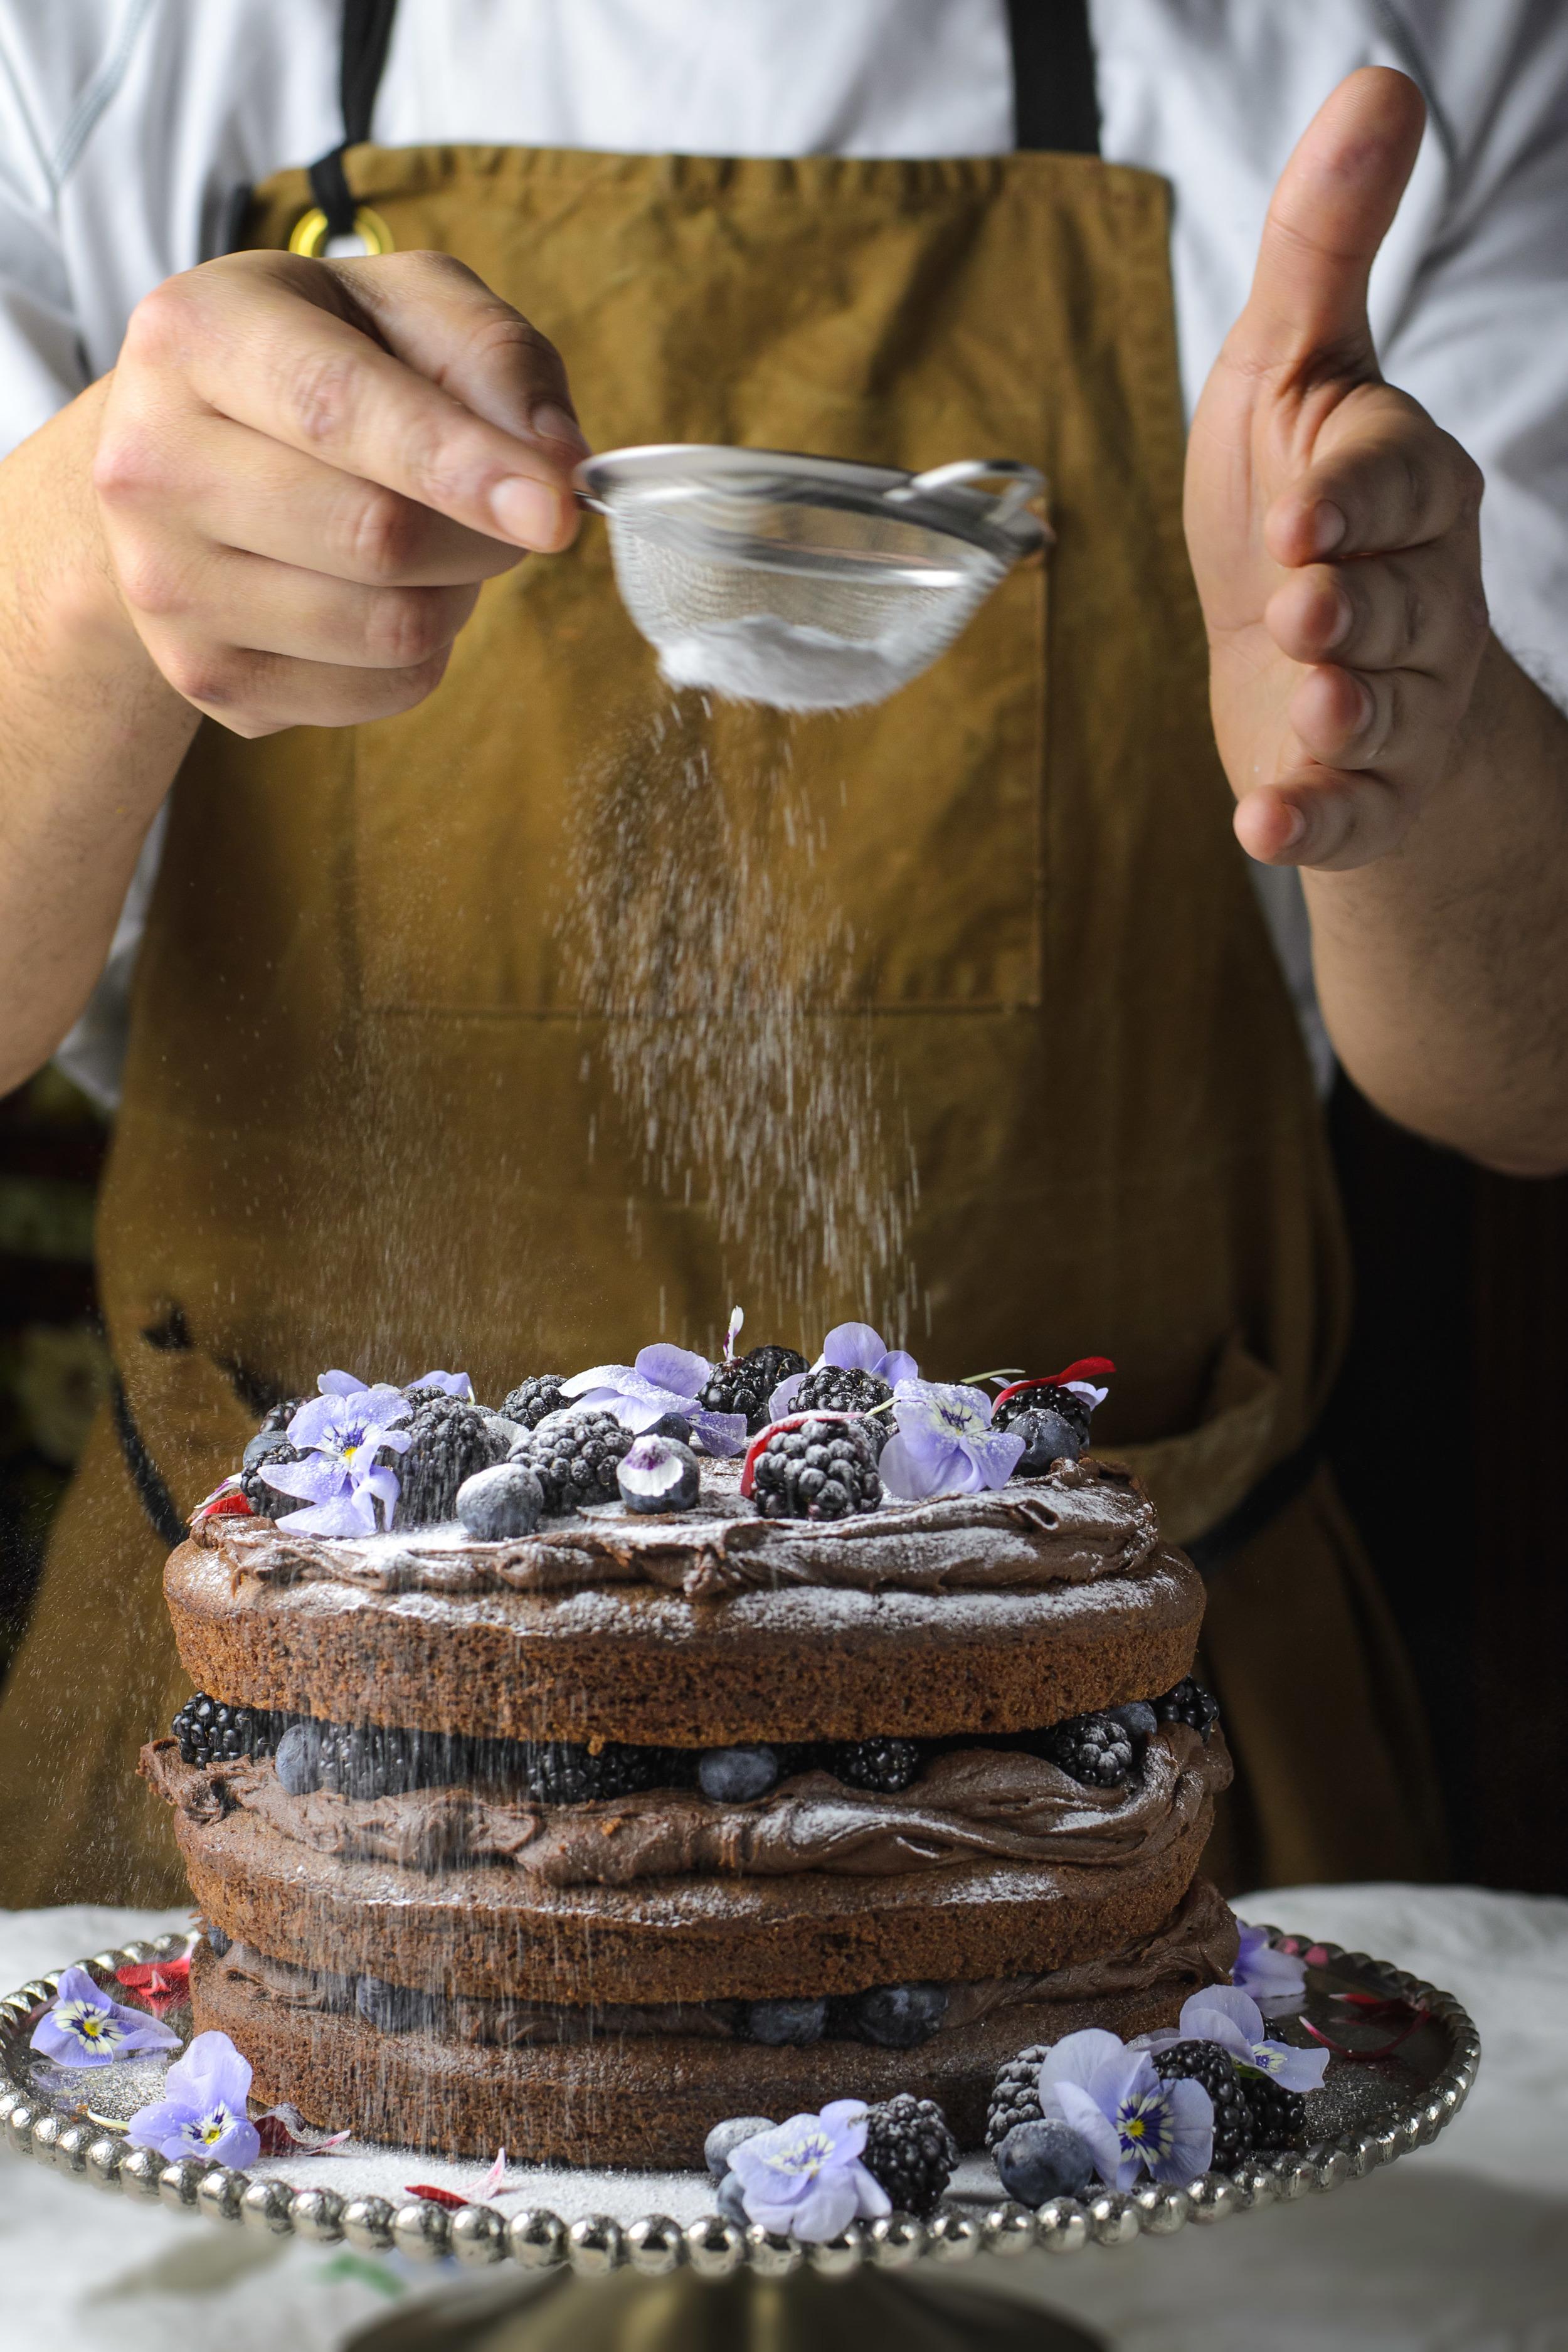 Cake_1.jpg